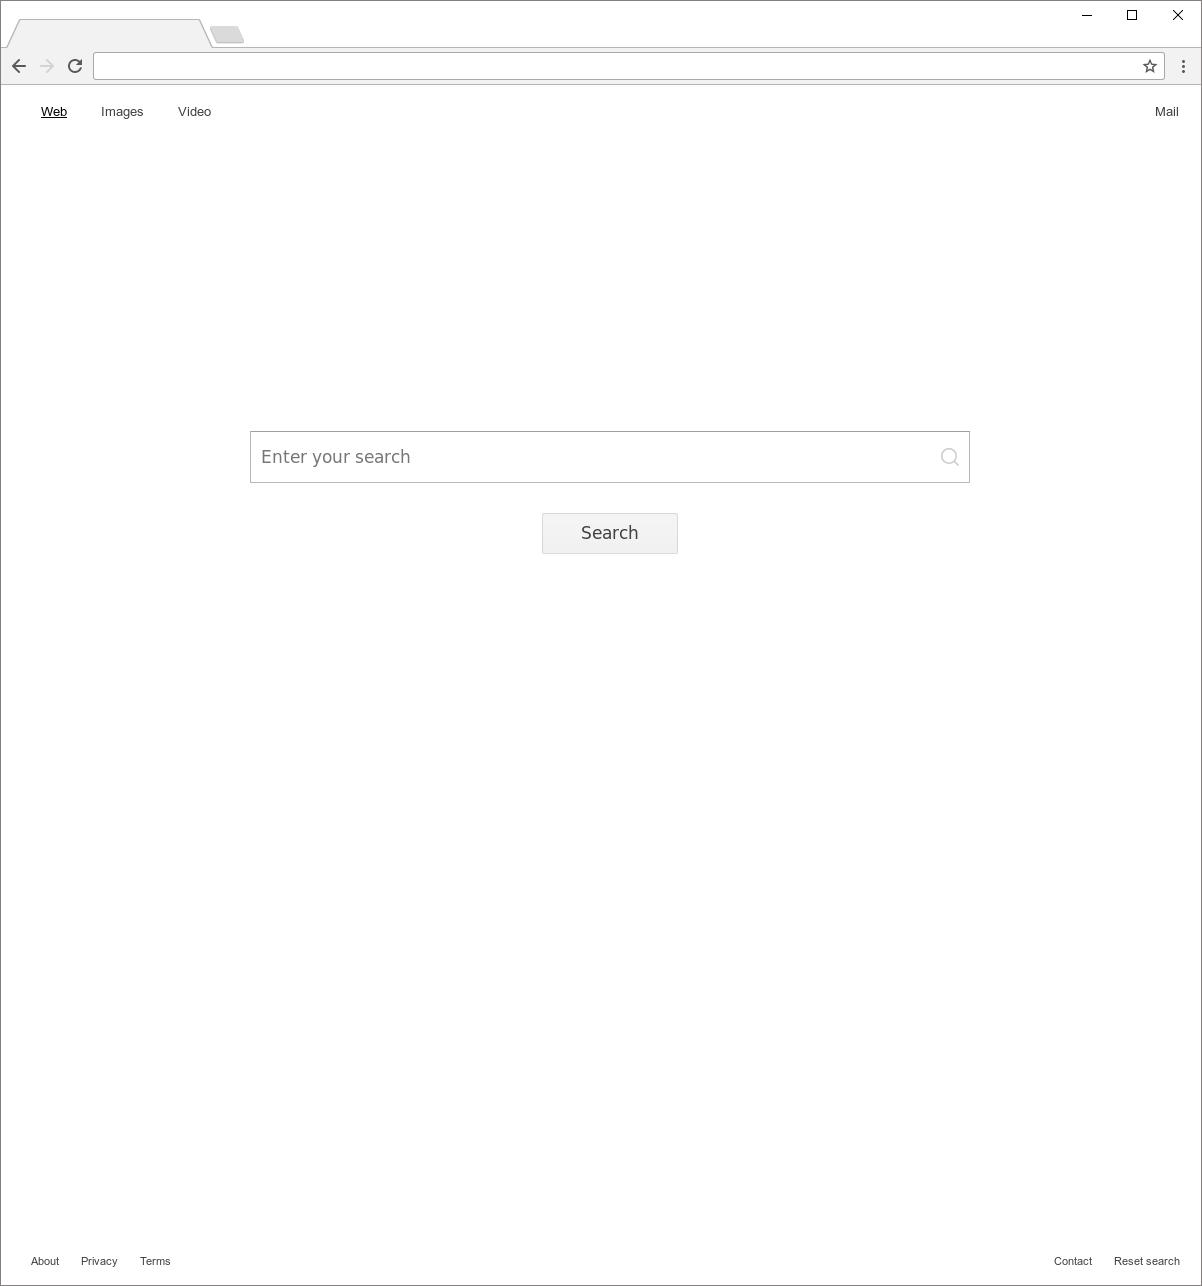 Search.nelrozplace.com Hijacker